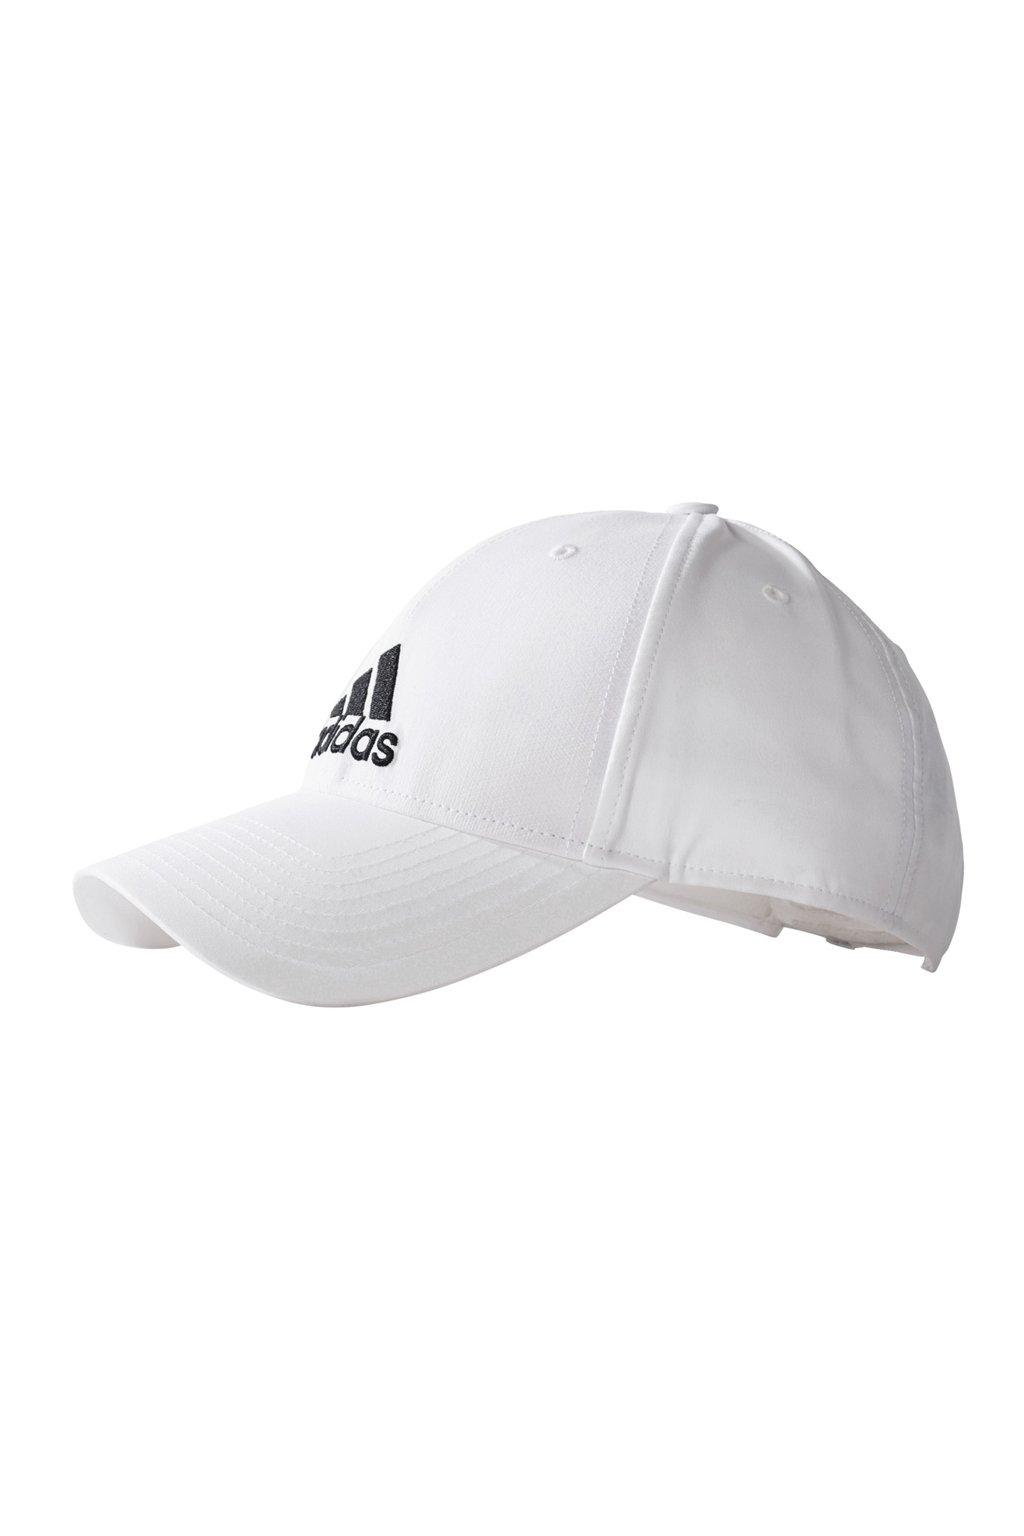 Adidas pánska šiltovka BK0794